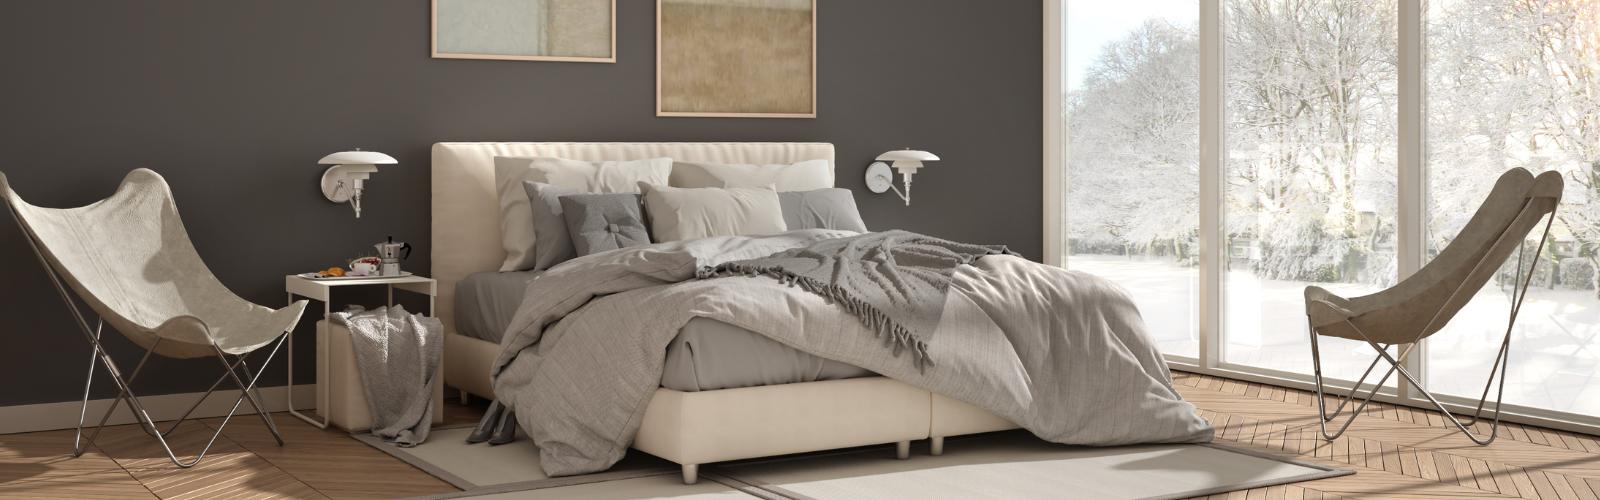 Bedroom Design in Alton